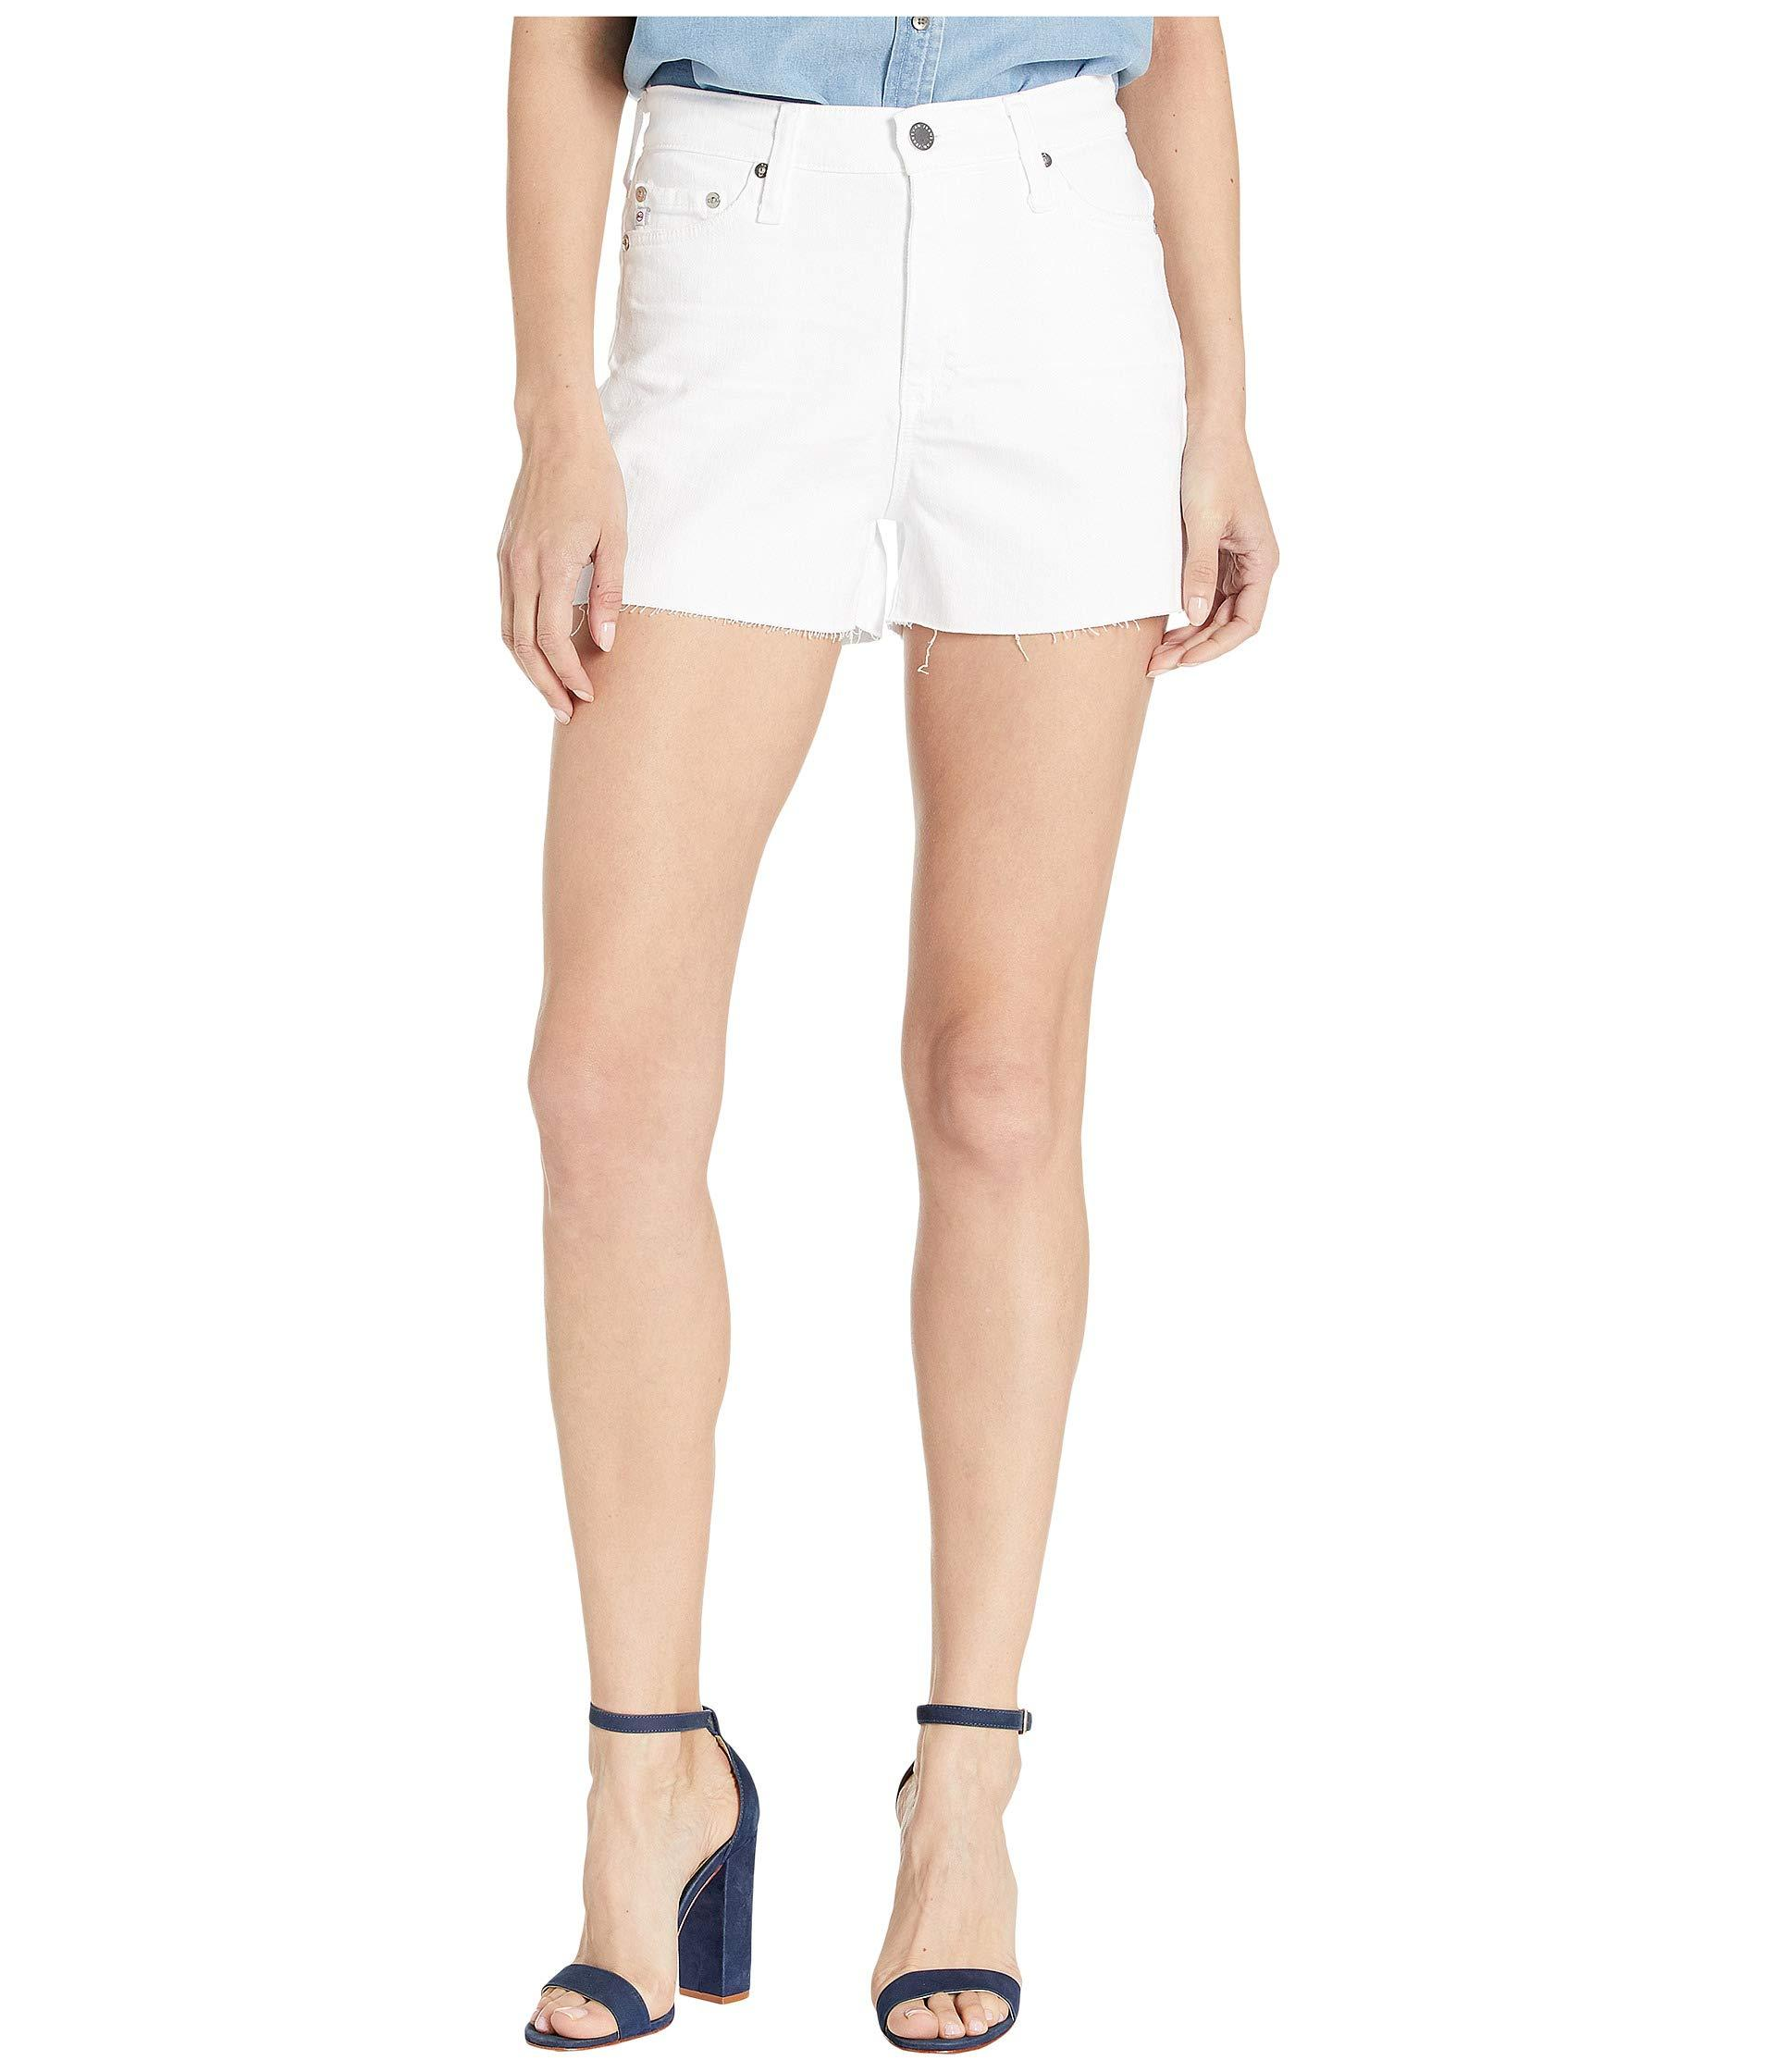 078b922f7 AG Jeans Mikkel Shorts In 1 Year Optic White (1 Year Optic White ...